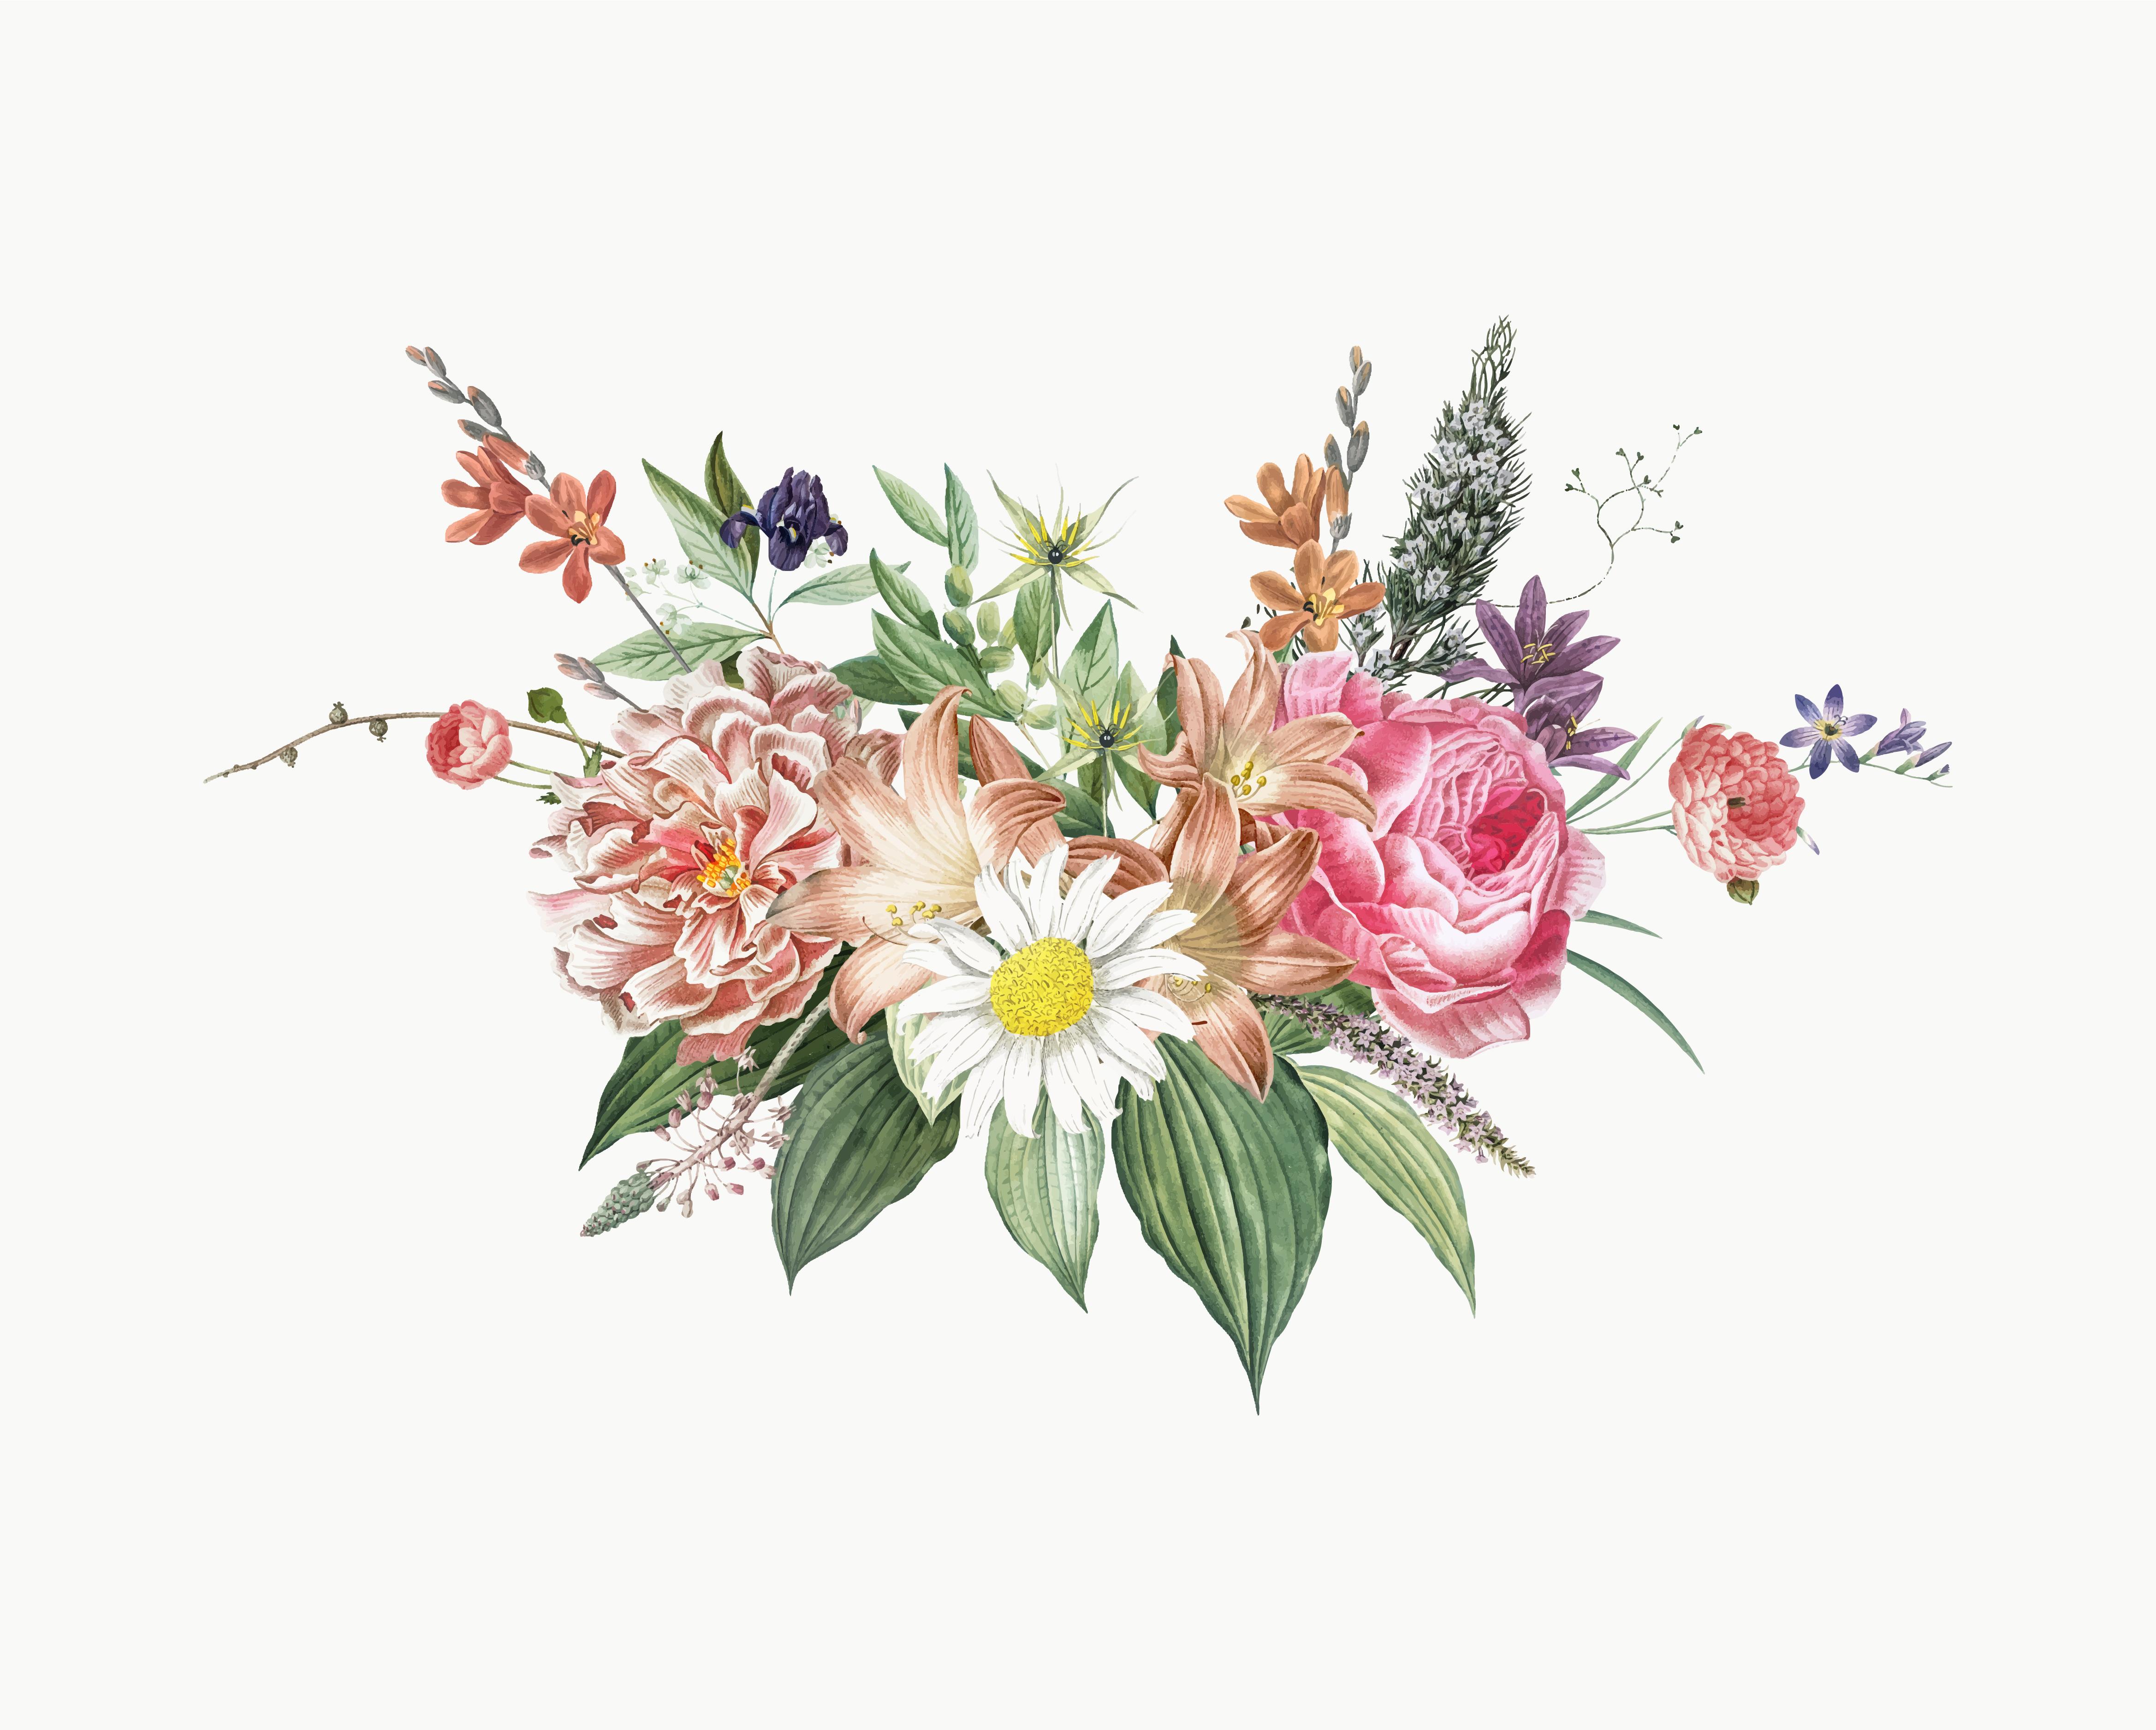 Mixed flower bouquet - Download Free Vectors, Clipart ...